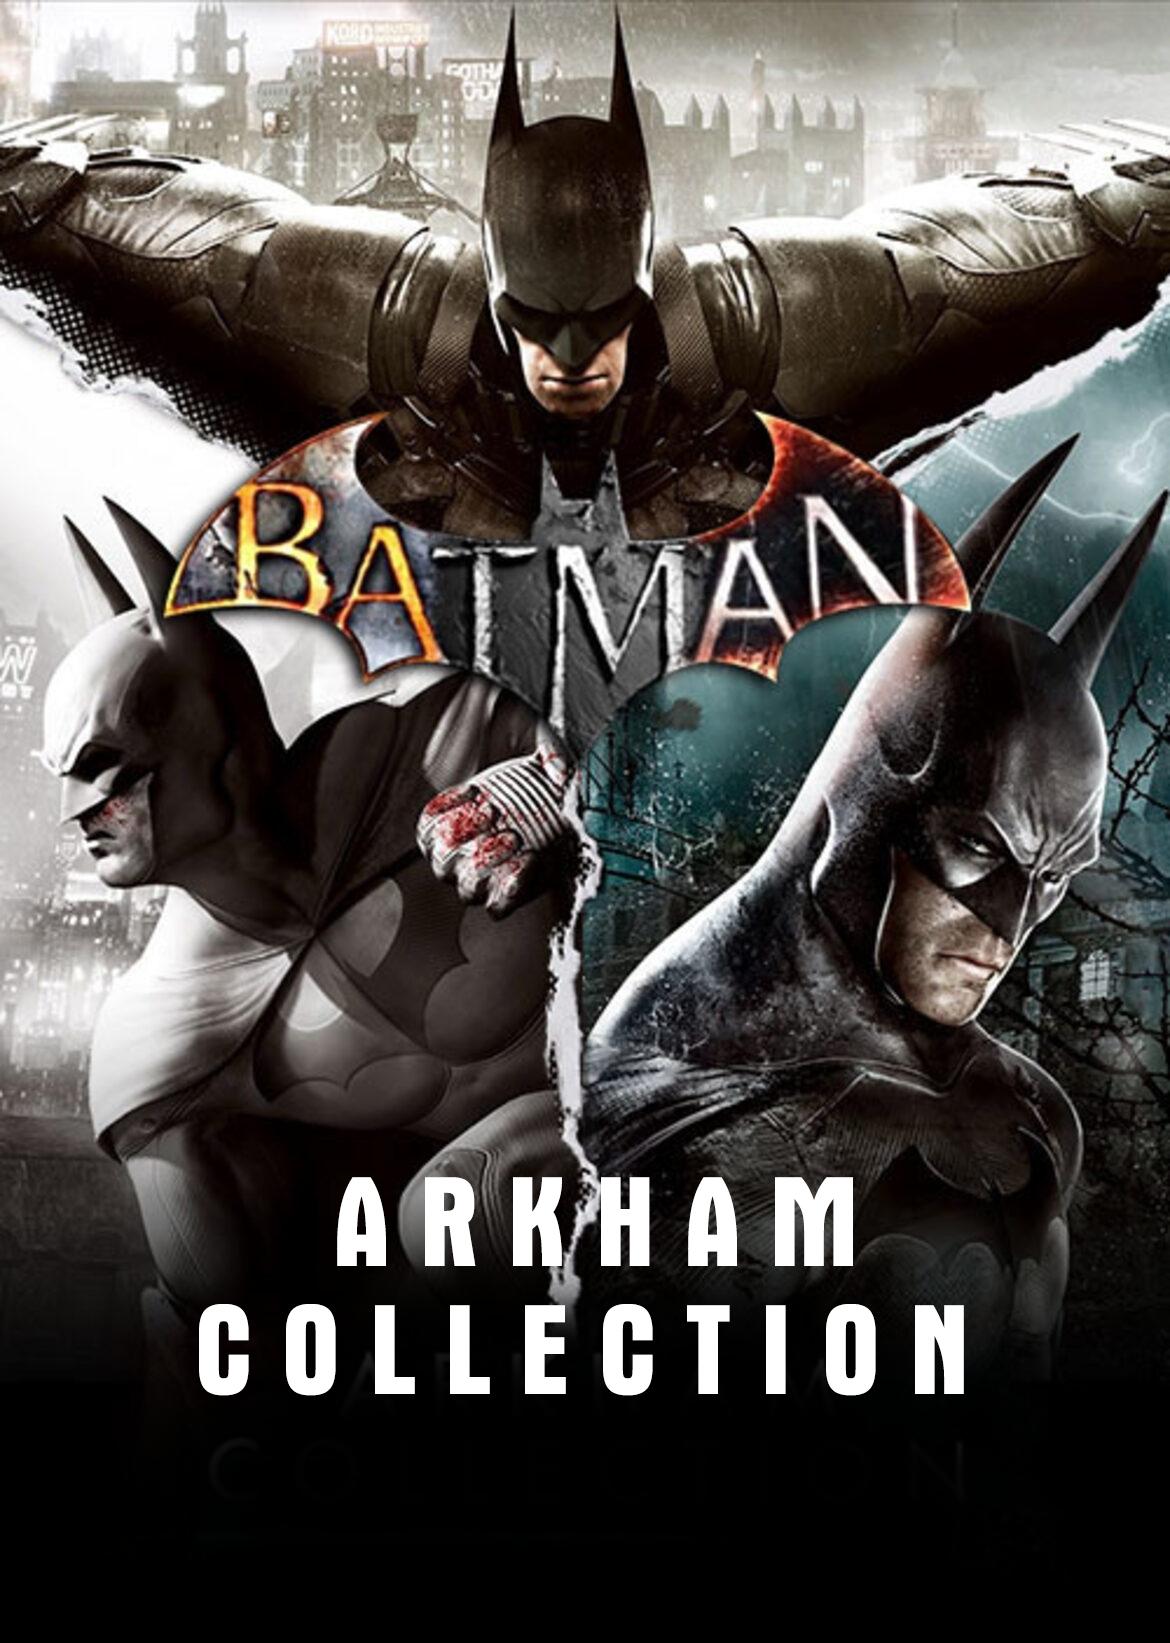 Batman: Arkham Collection za 26,78 zł na Instant Gaming 5.95€